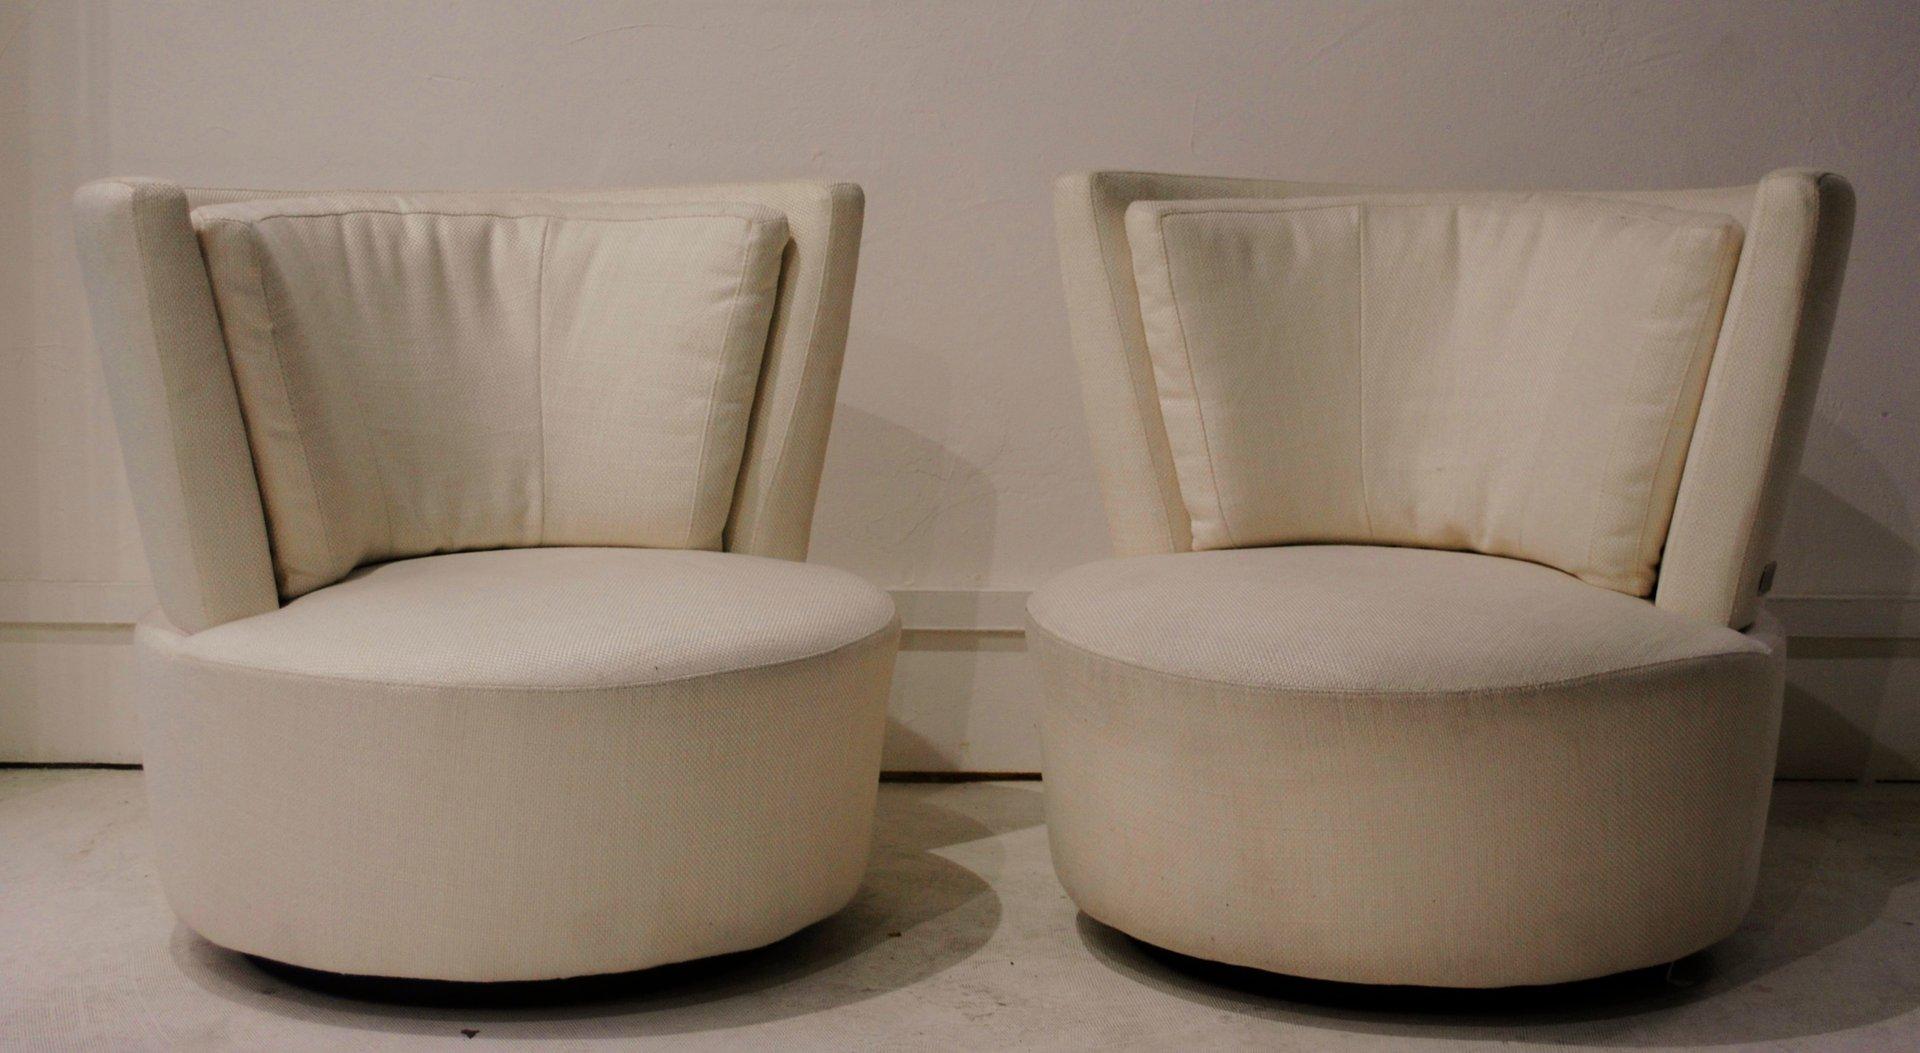 Ivory Swivel Chairs By Vladimir Kagan, Set Of 2